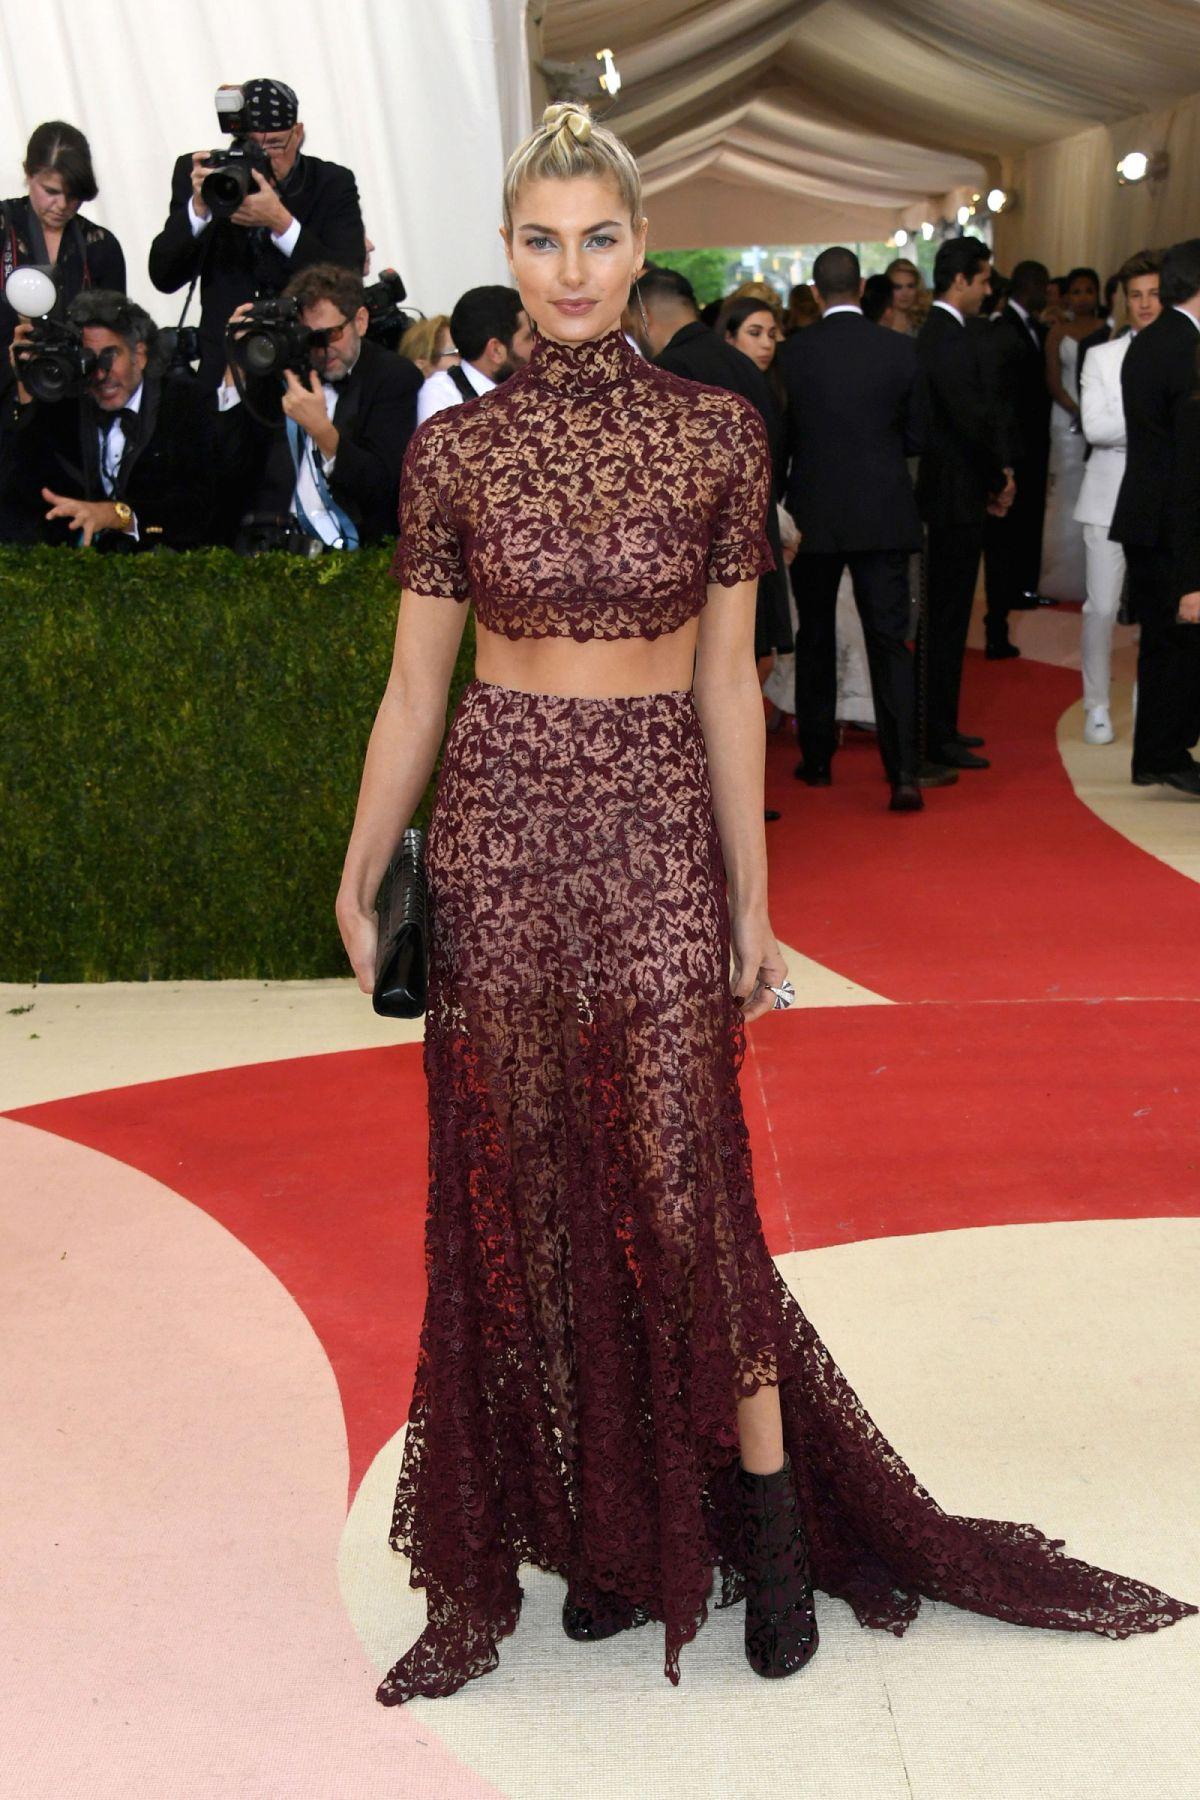 JESSICA HART at Costume Institute Gala 2016 in New York 05/02/2016